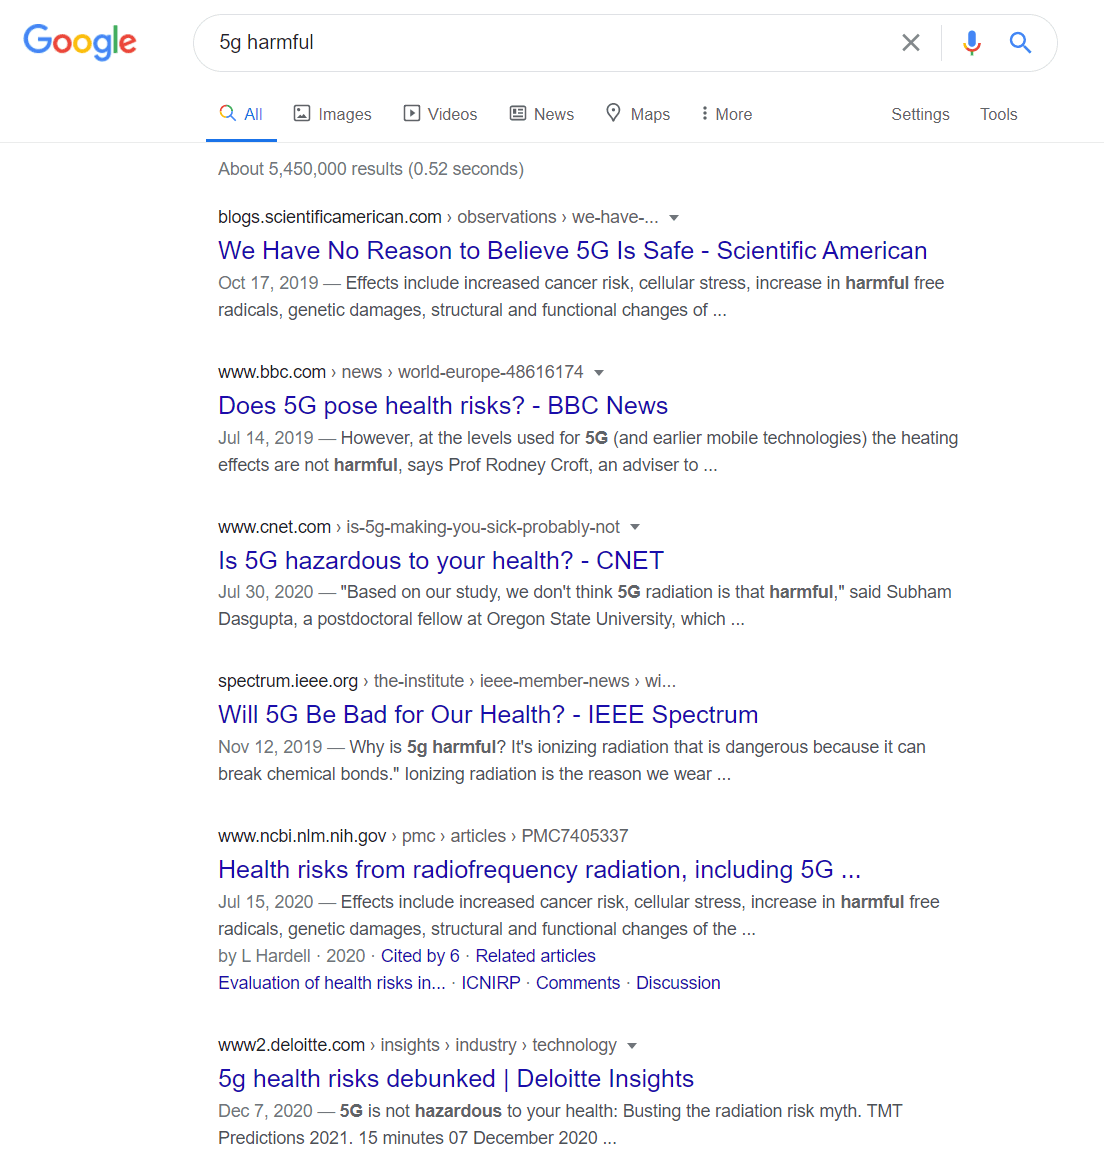 Google 5g harmful